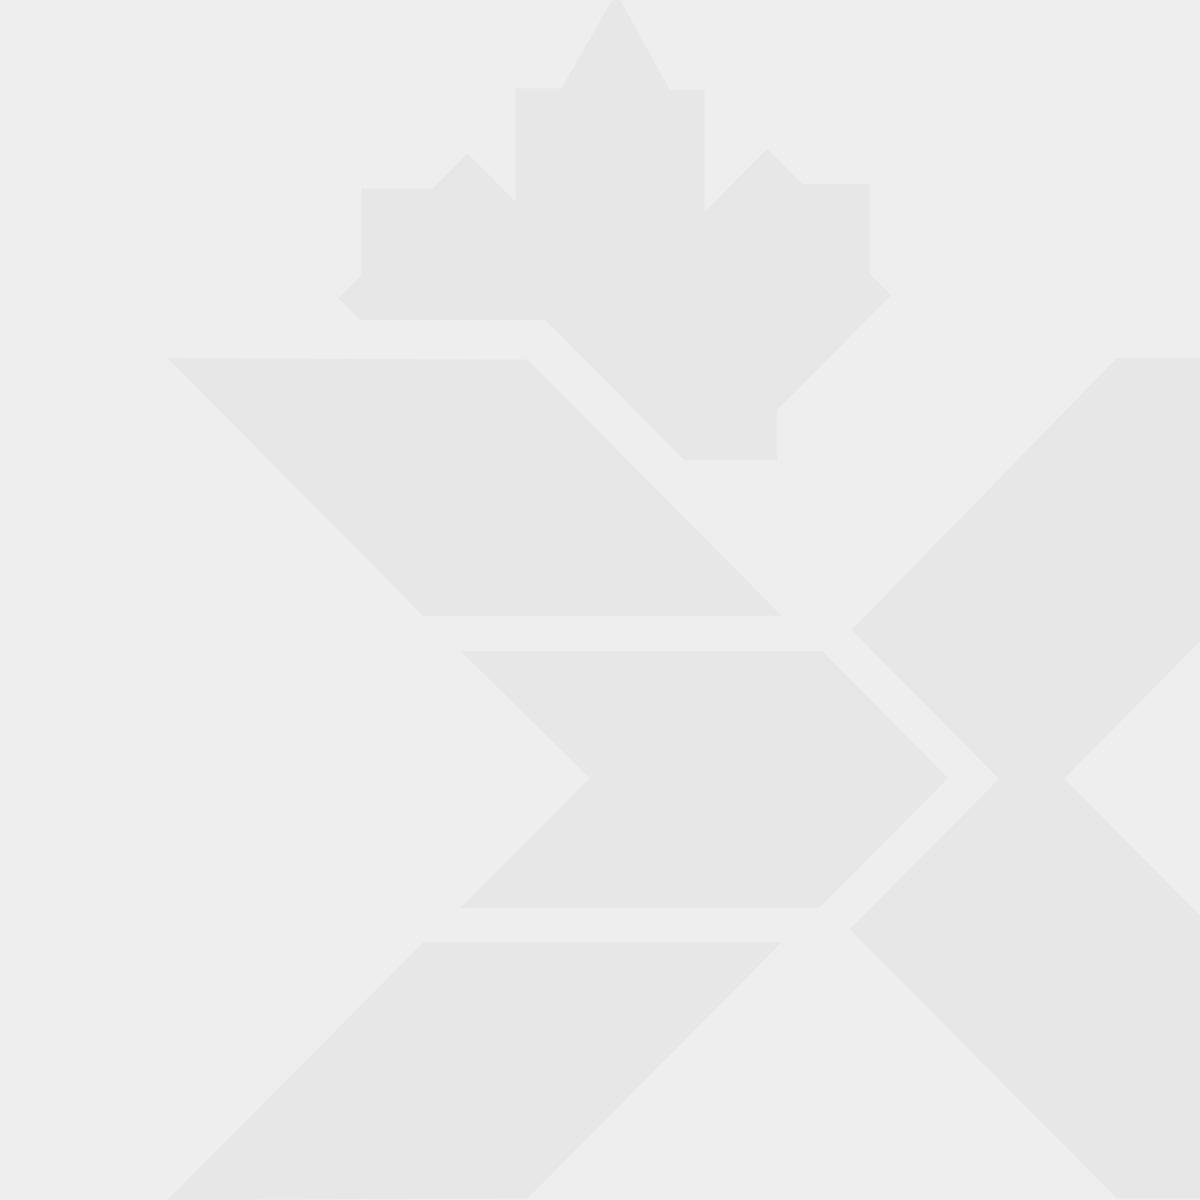 NEST 2nd Gen Smoke & Carbon Monoxide Alarm